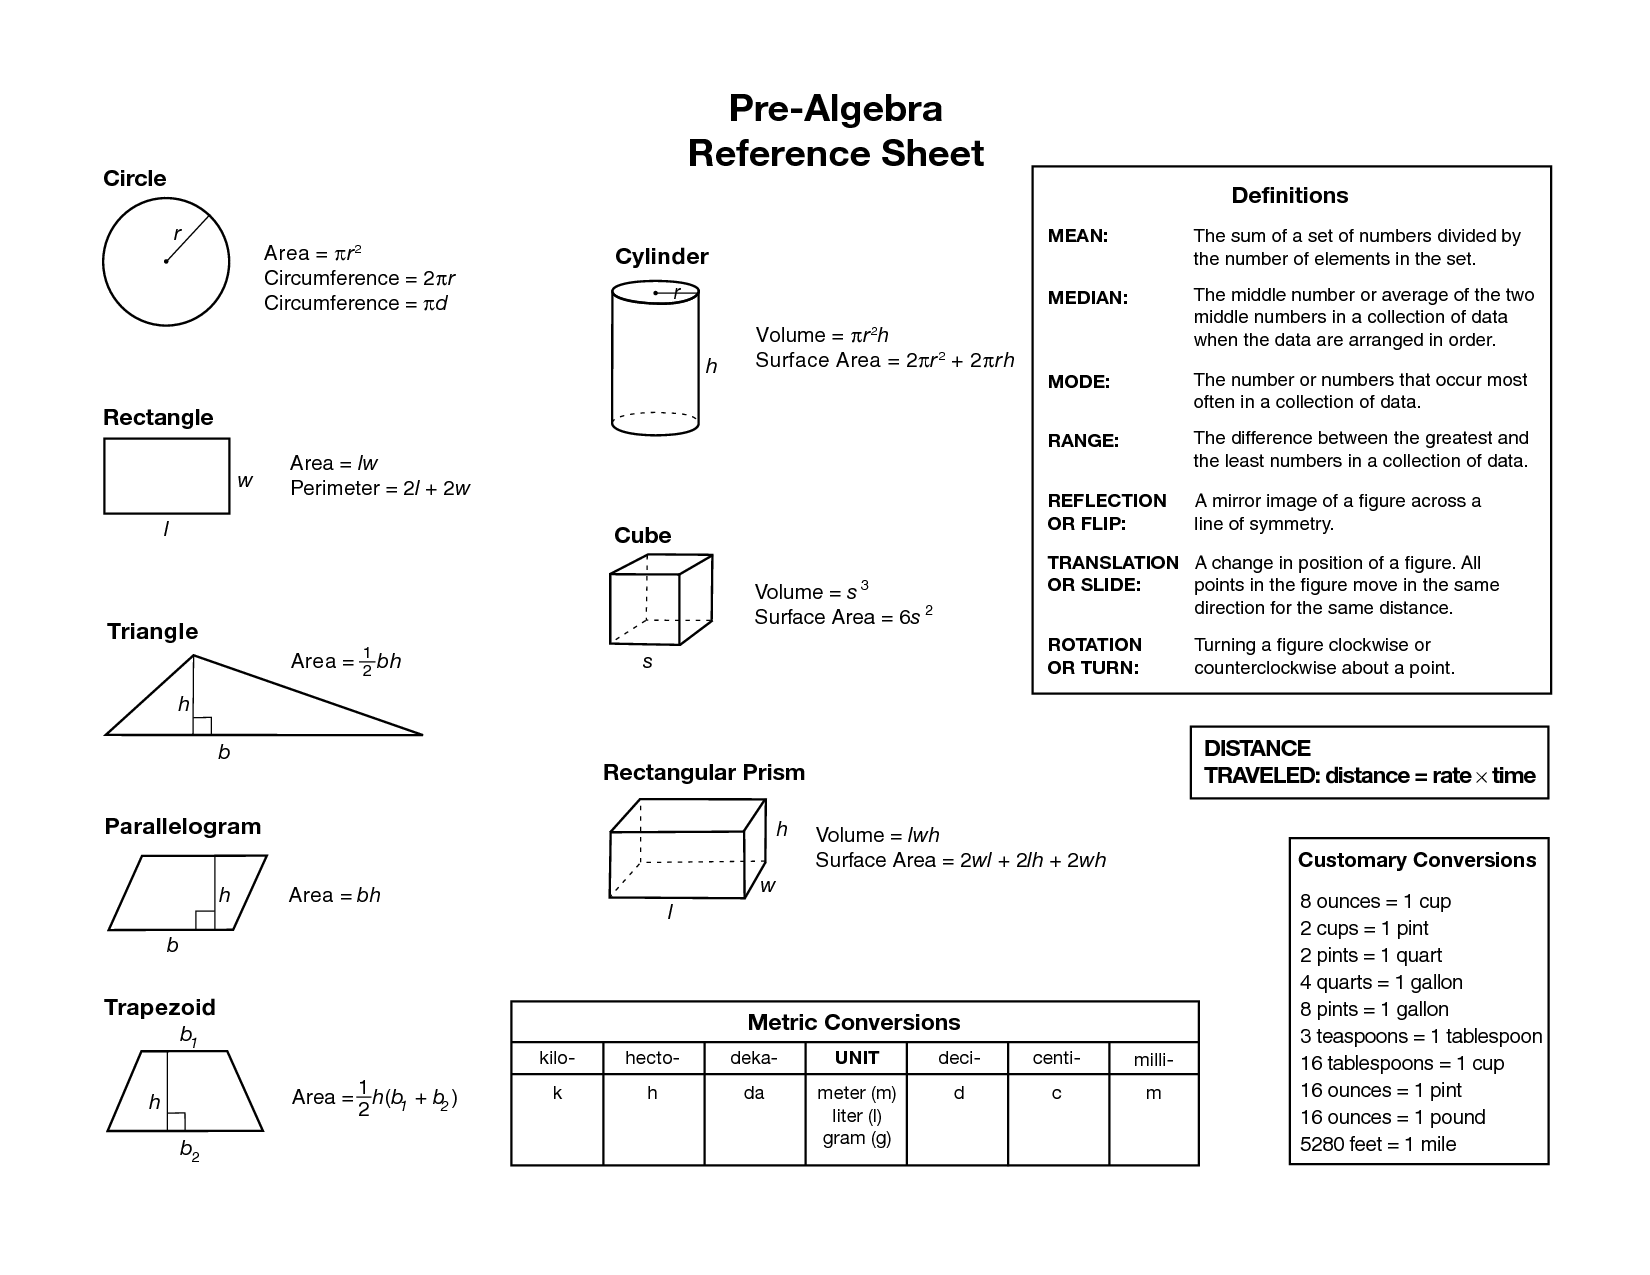 Pre Algebra Reference Sheet   Pre algebra worksheets [ 1275 x 1650 Pixel ]